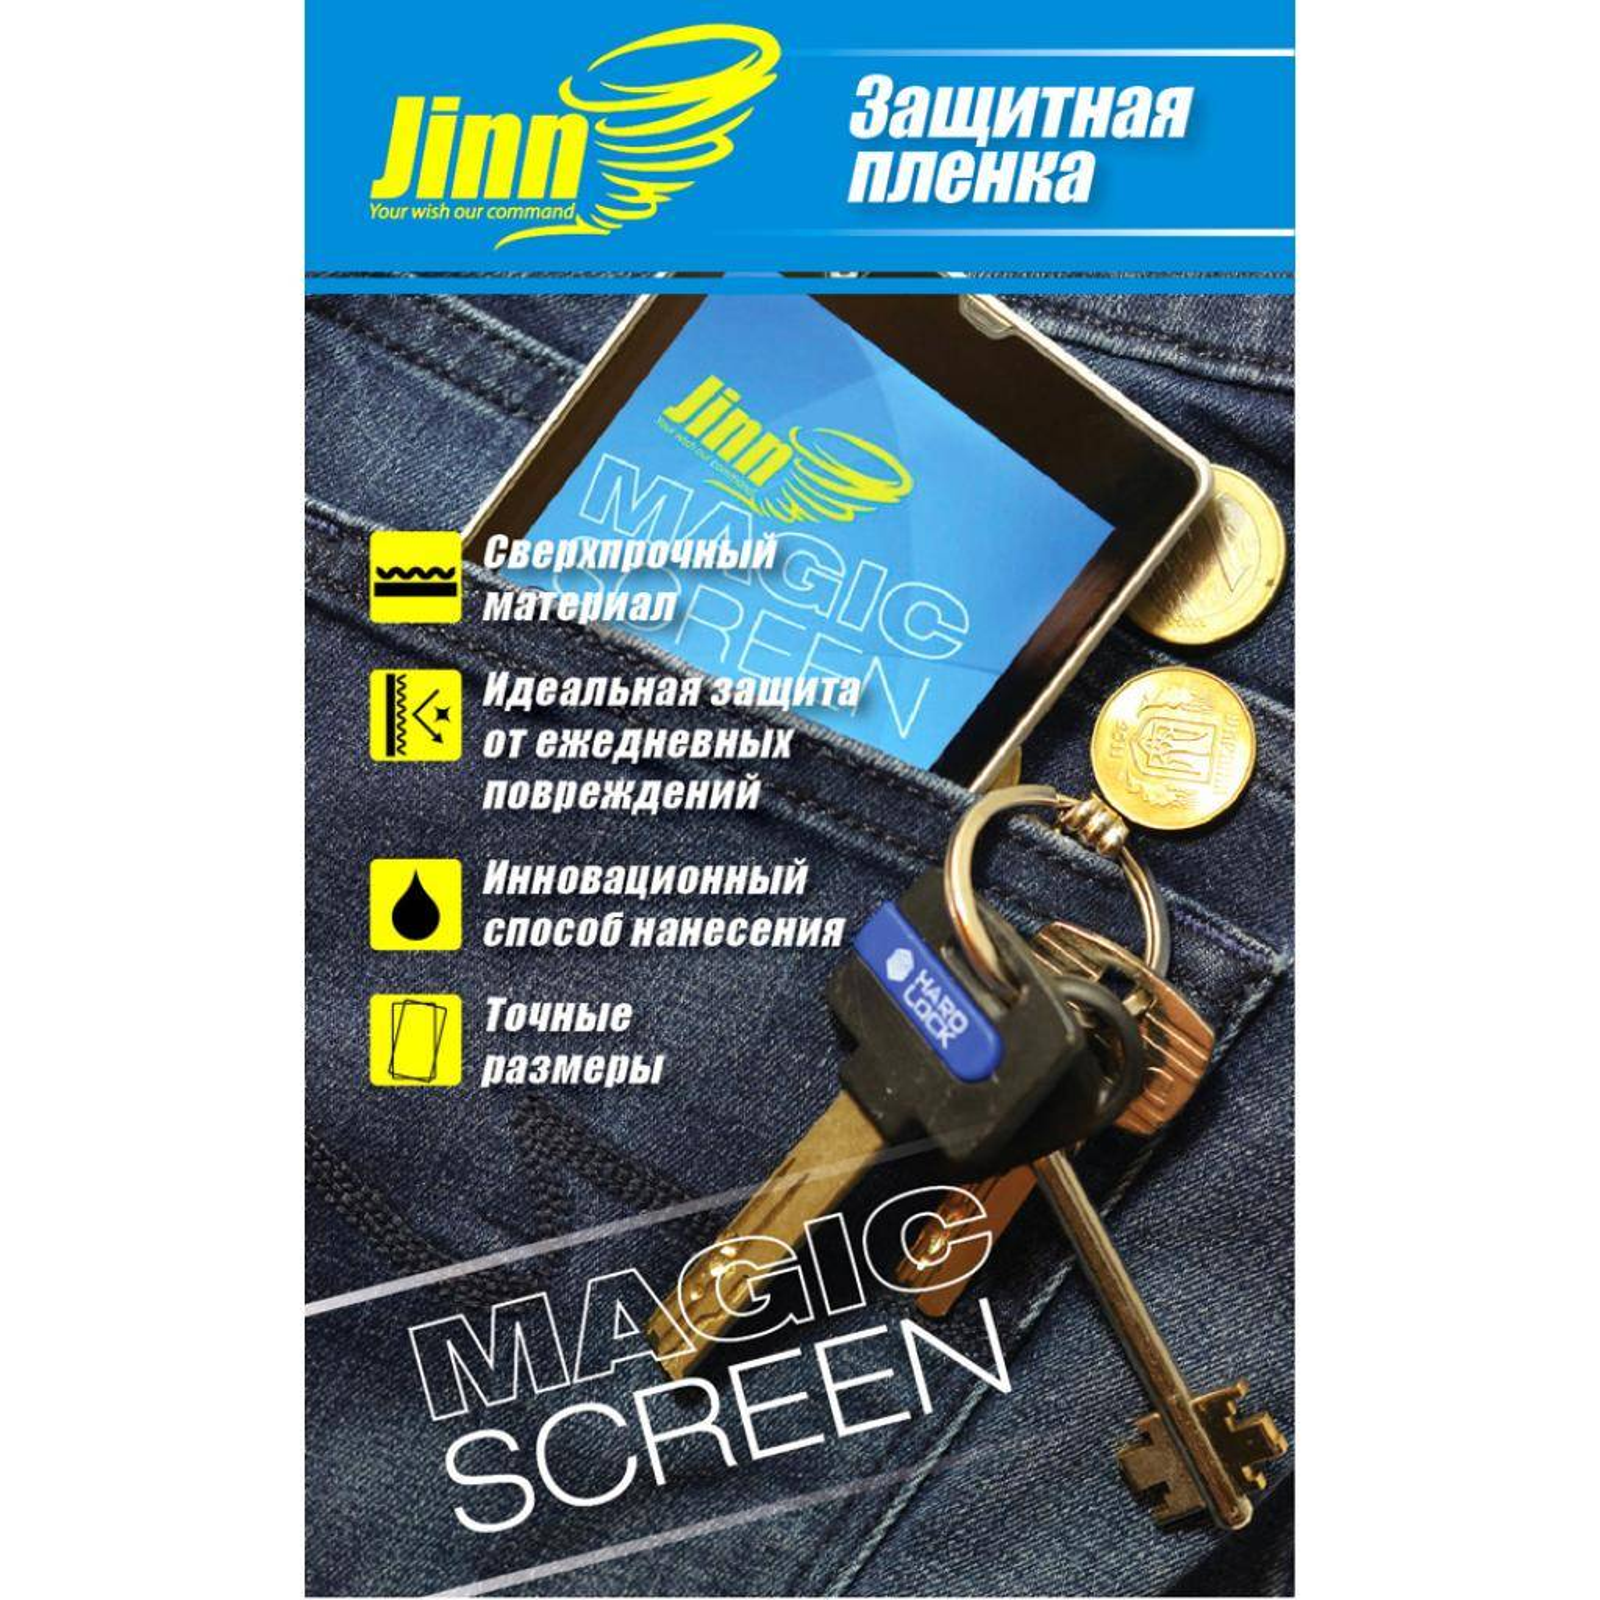 Пленка защитная JINN ультрапрочная Magic Screen для Sony Xperia E C1505 / C1605 (Sony Xperia E front)